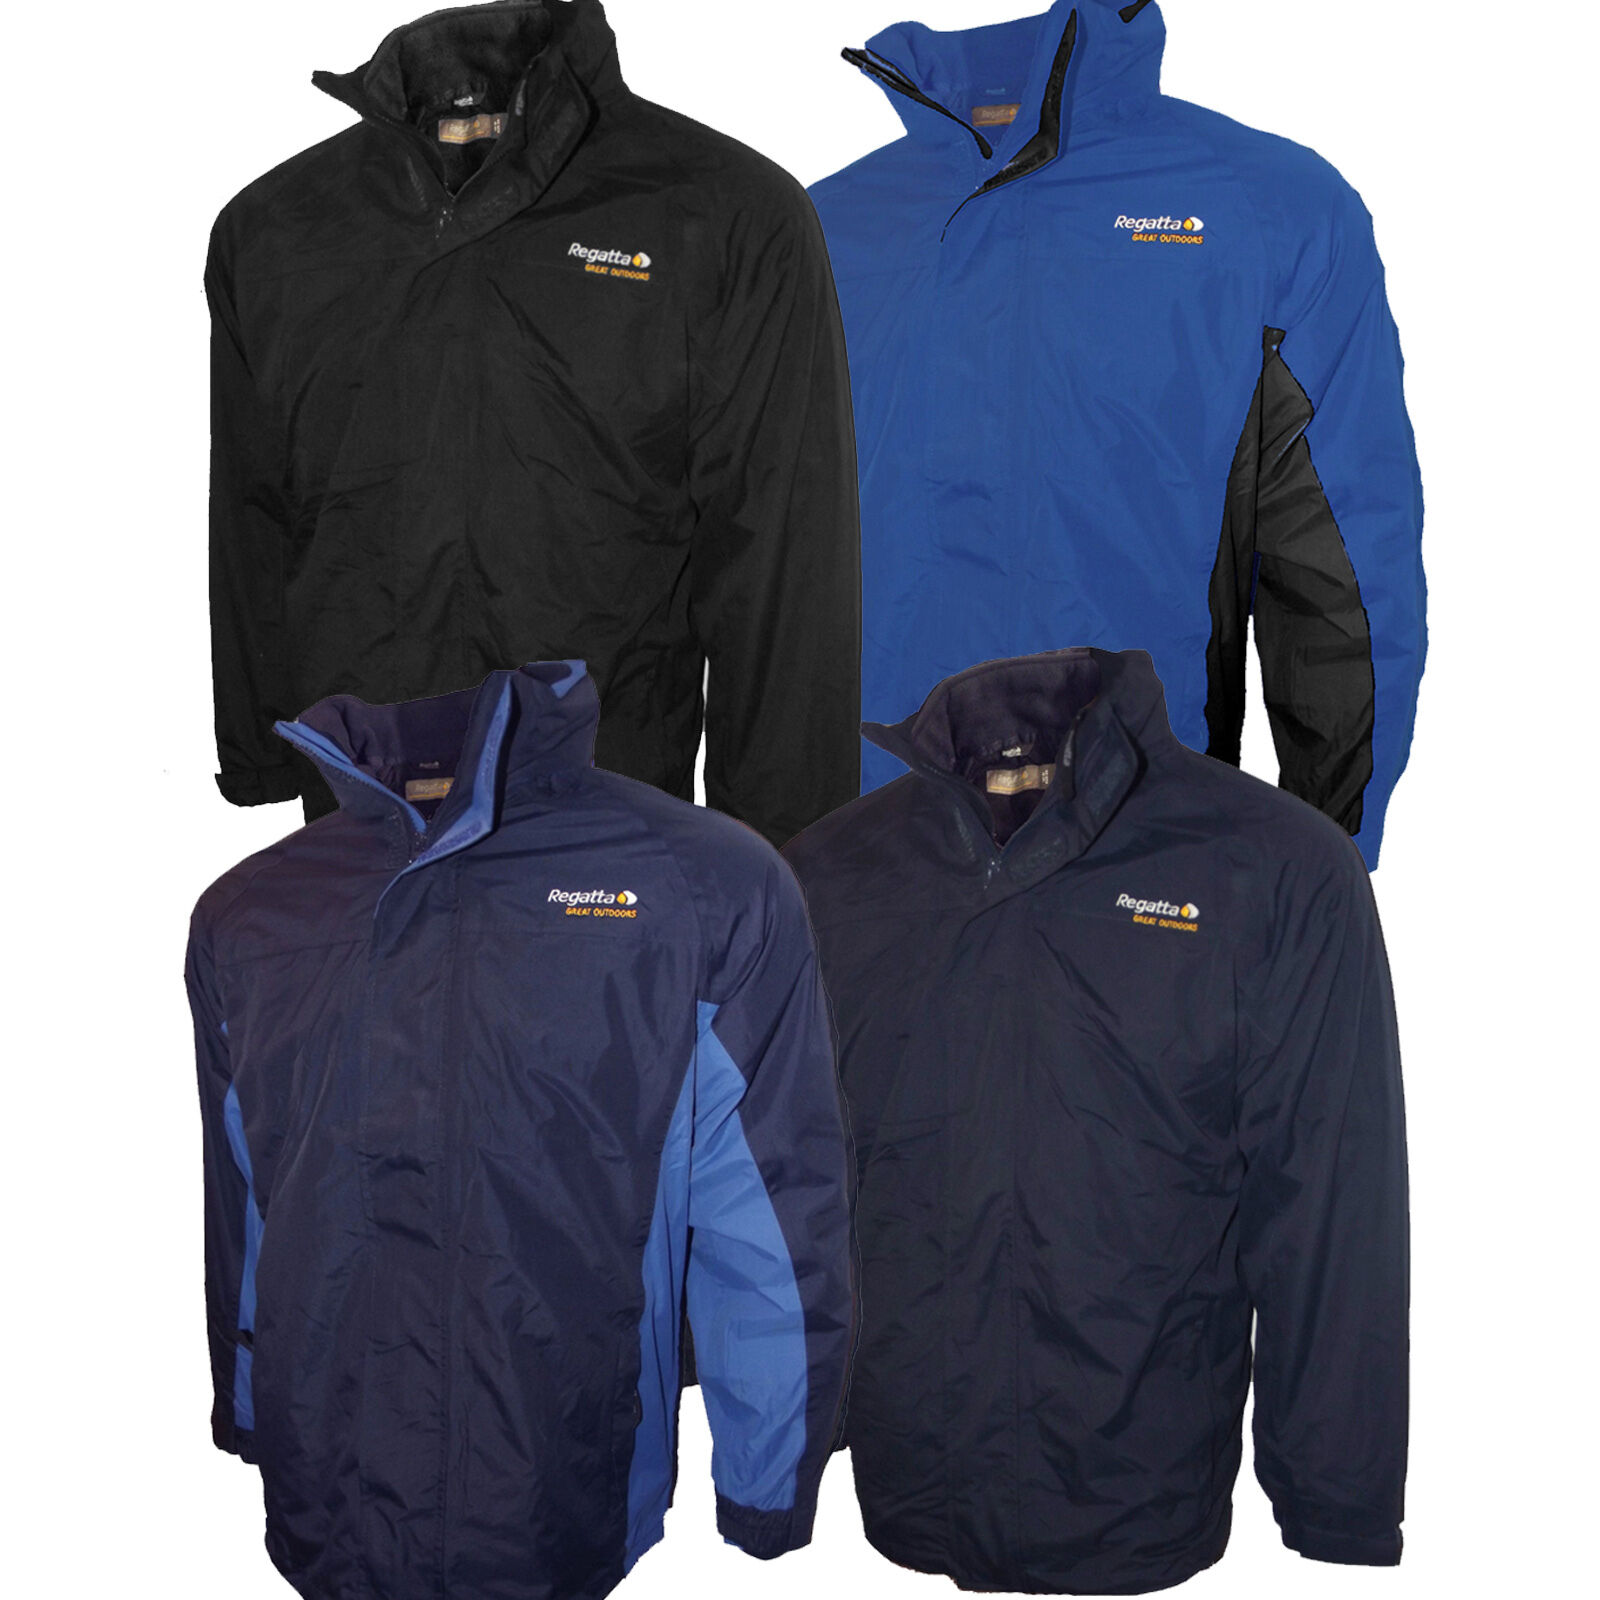 Mens regatta jacket - Regatta Jacket 3 In 1 Mens Thor Iii Fleece Interactive Hydrafort Waterproof New